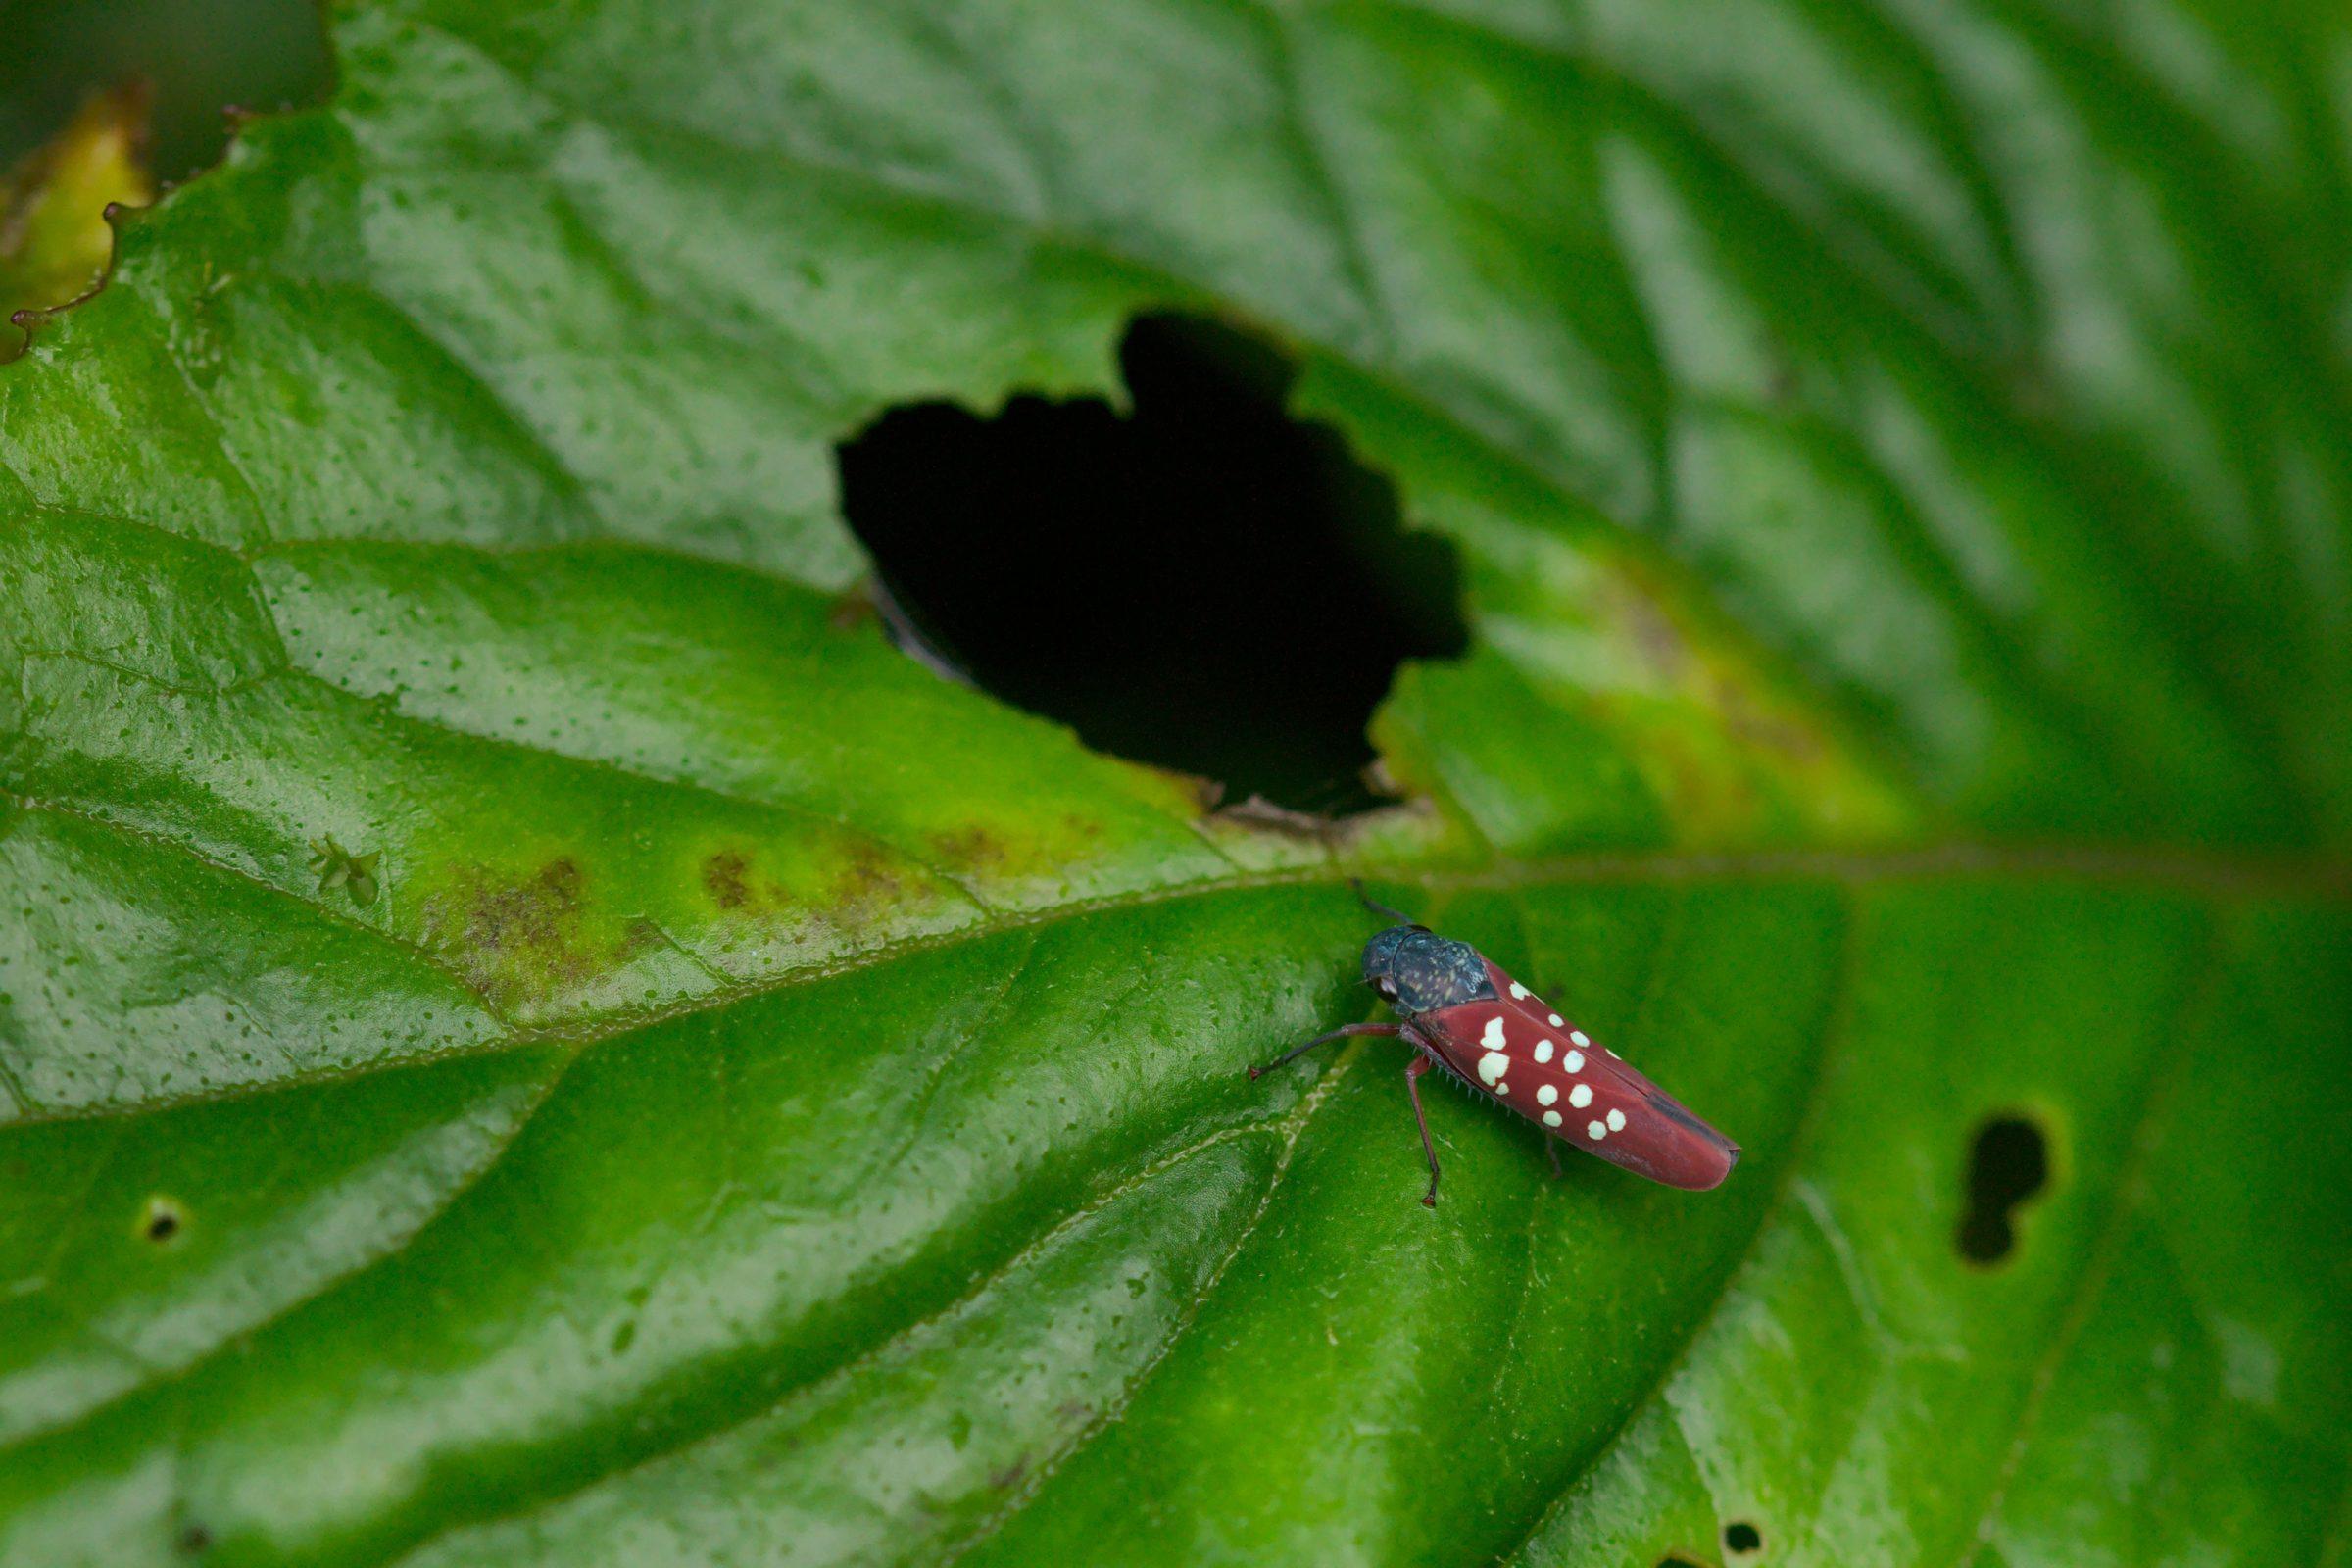 "<a href=""/graphocephala-albomaculata"" target=""_blank"" rel=""noopener noreferrer""><i>Graphocephala albomaculata</i> (Zwergzikade)</a>"